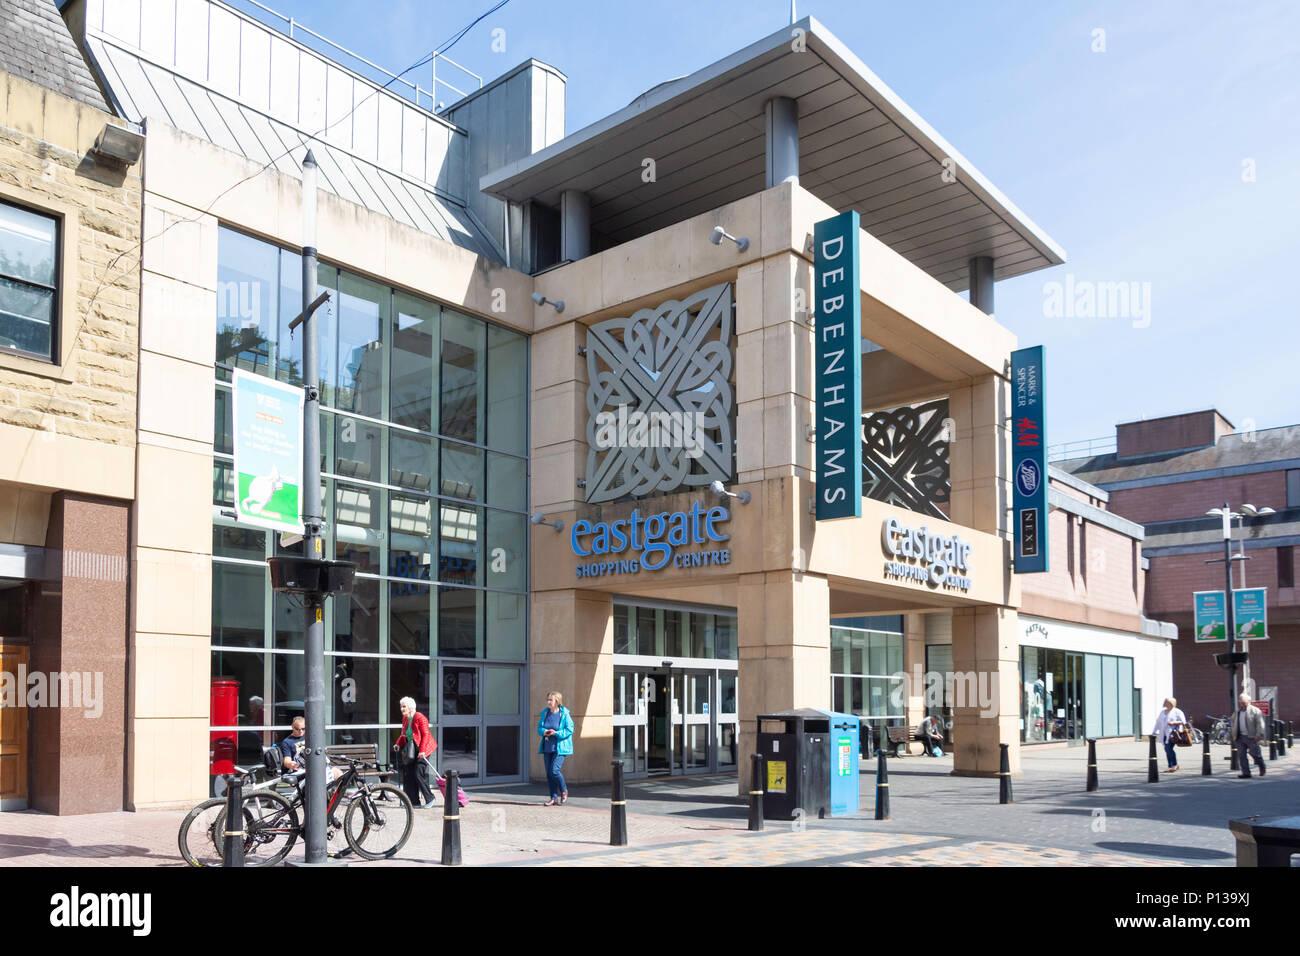 Entrance to Eastgate shopping Centre, Eastgate, Inverness, Highland, Scotland, United Kingdom - Stock Image